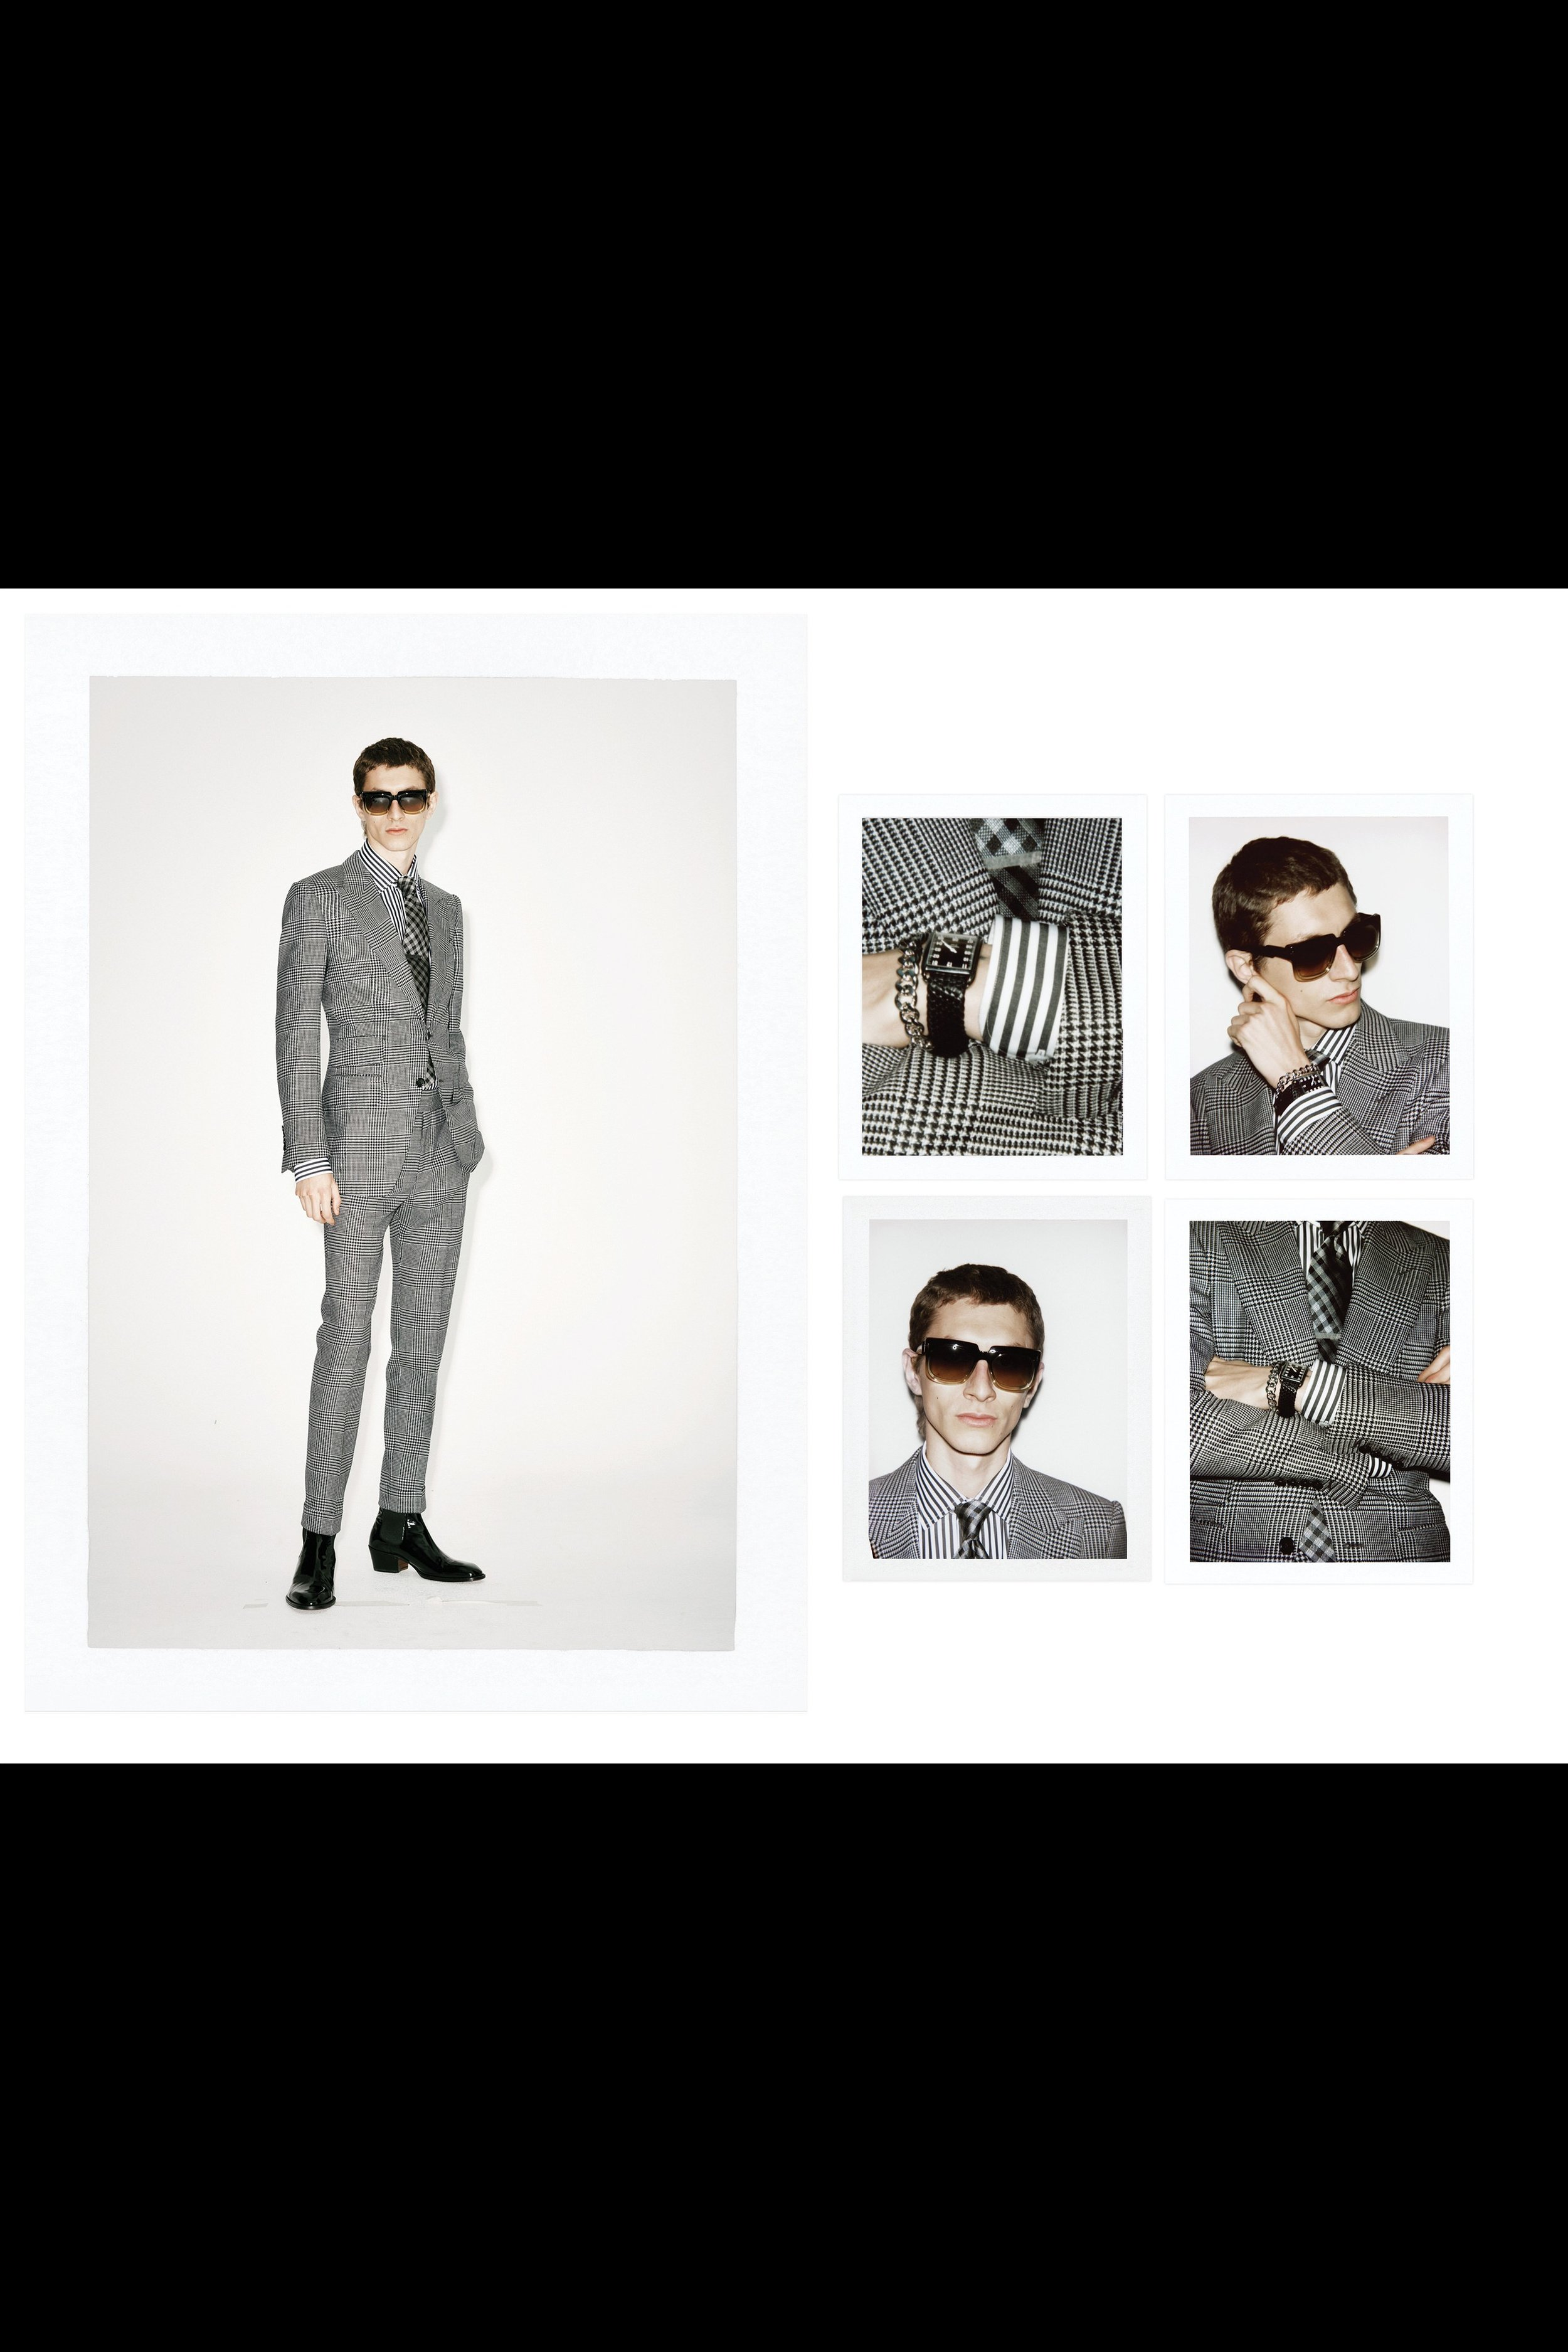 00001-Tom-Ford-vogue-menswear-spring-2019-pr.jpg